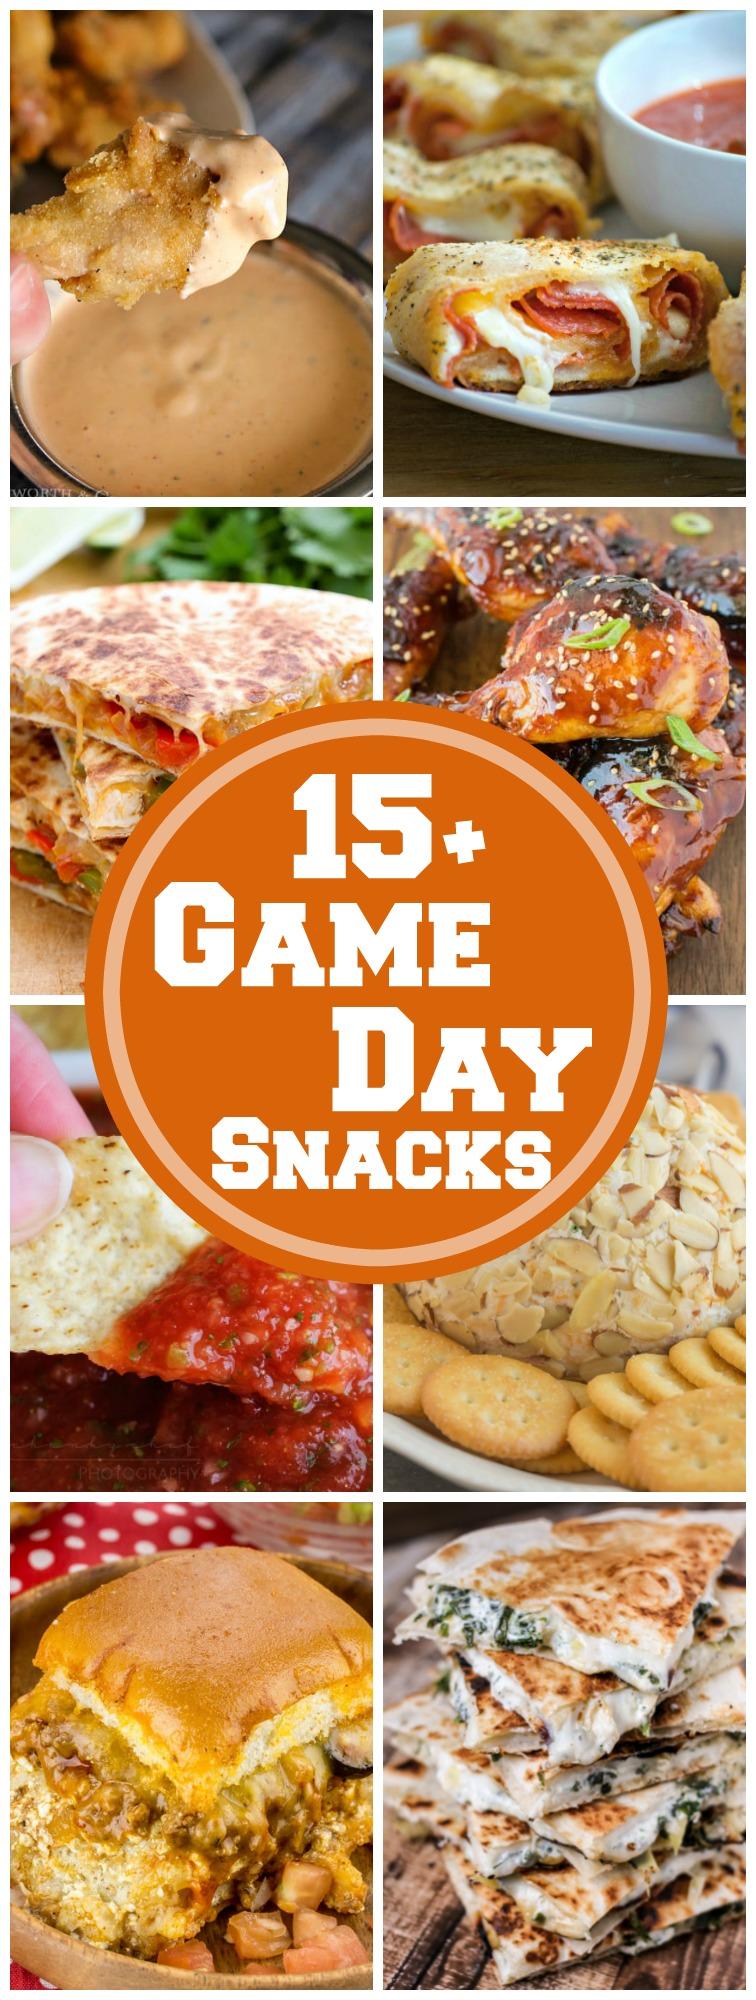 15+ Game Day Snacks